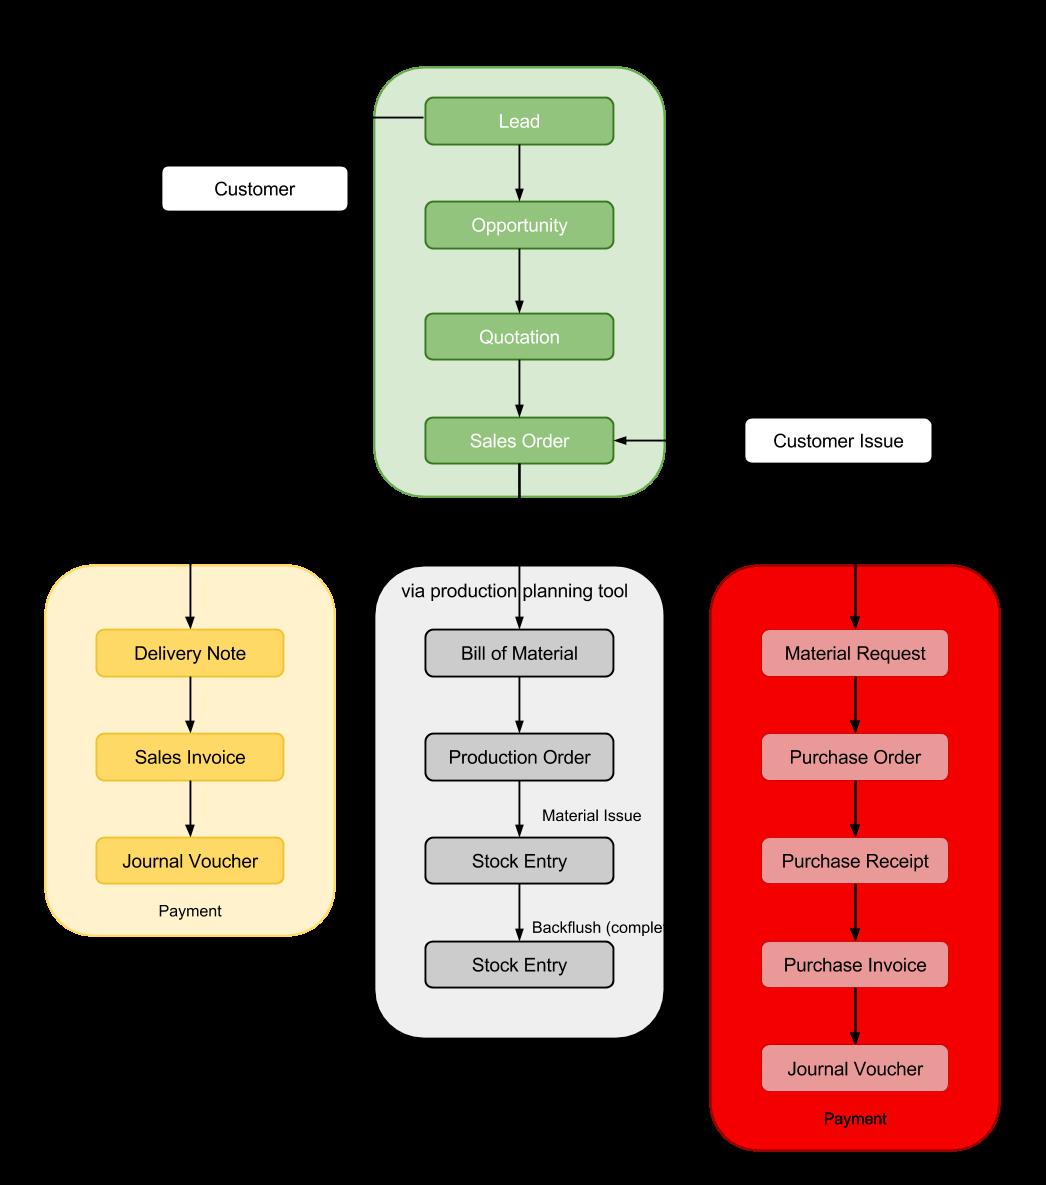 Erpnext Tutorials  Flow Chart Of Transactions In Erpnext